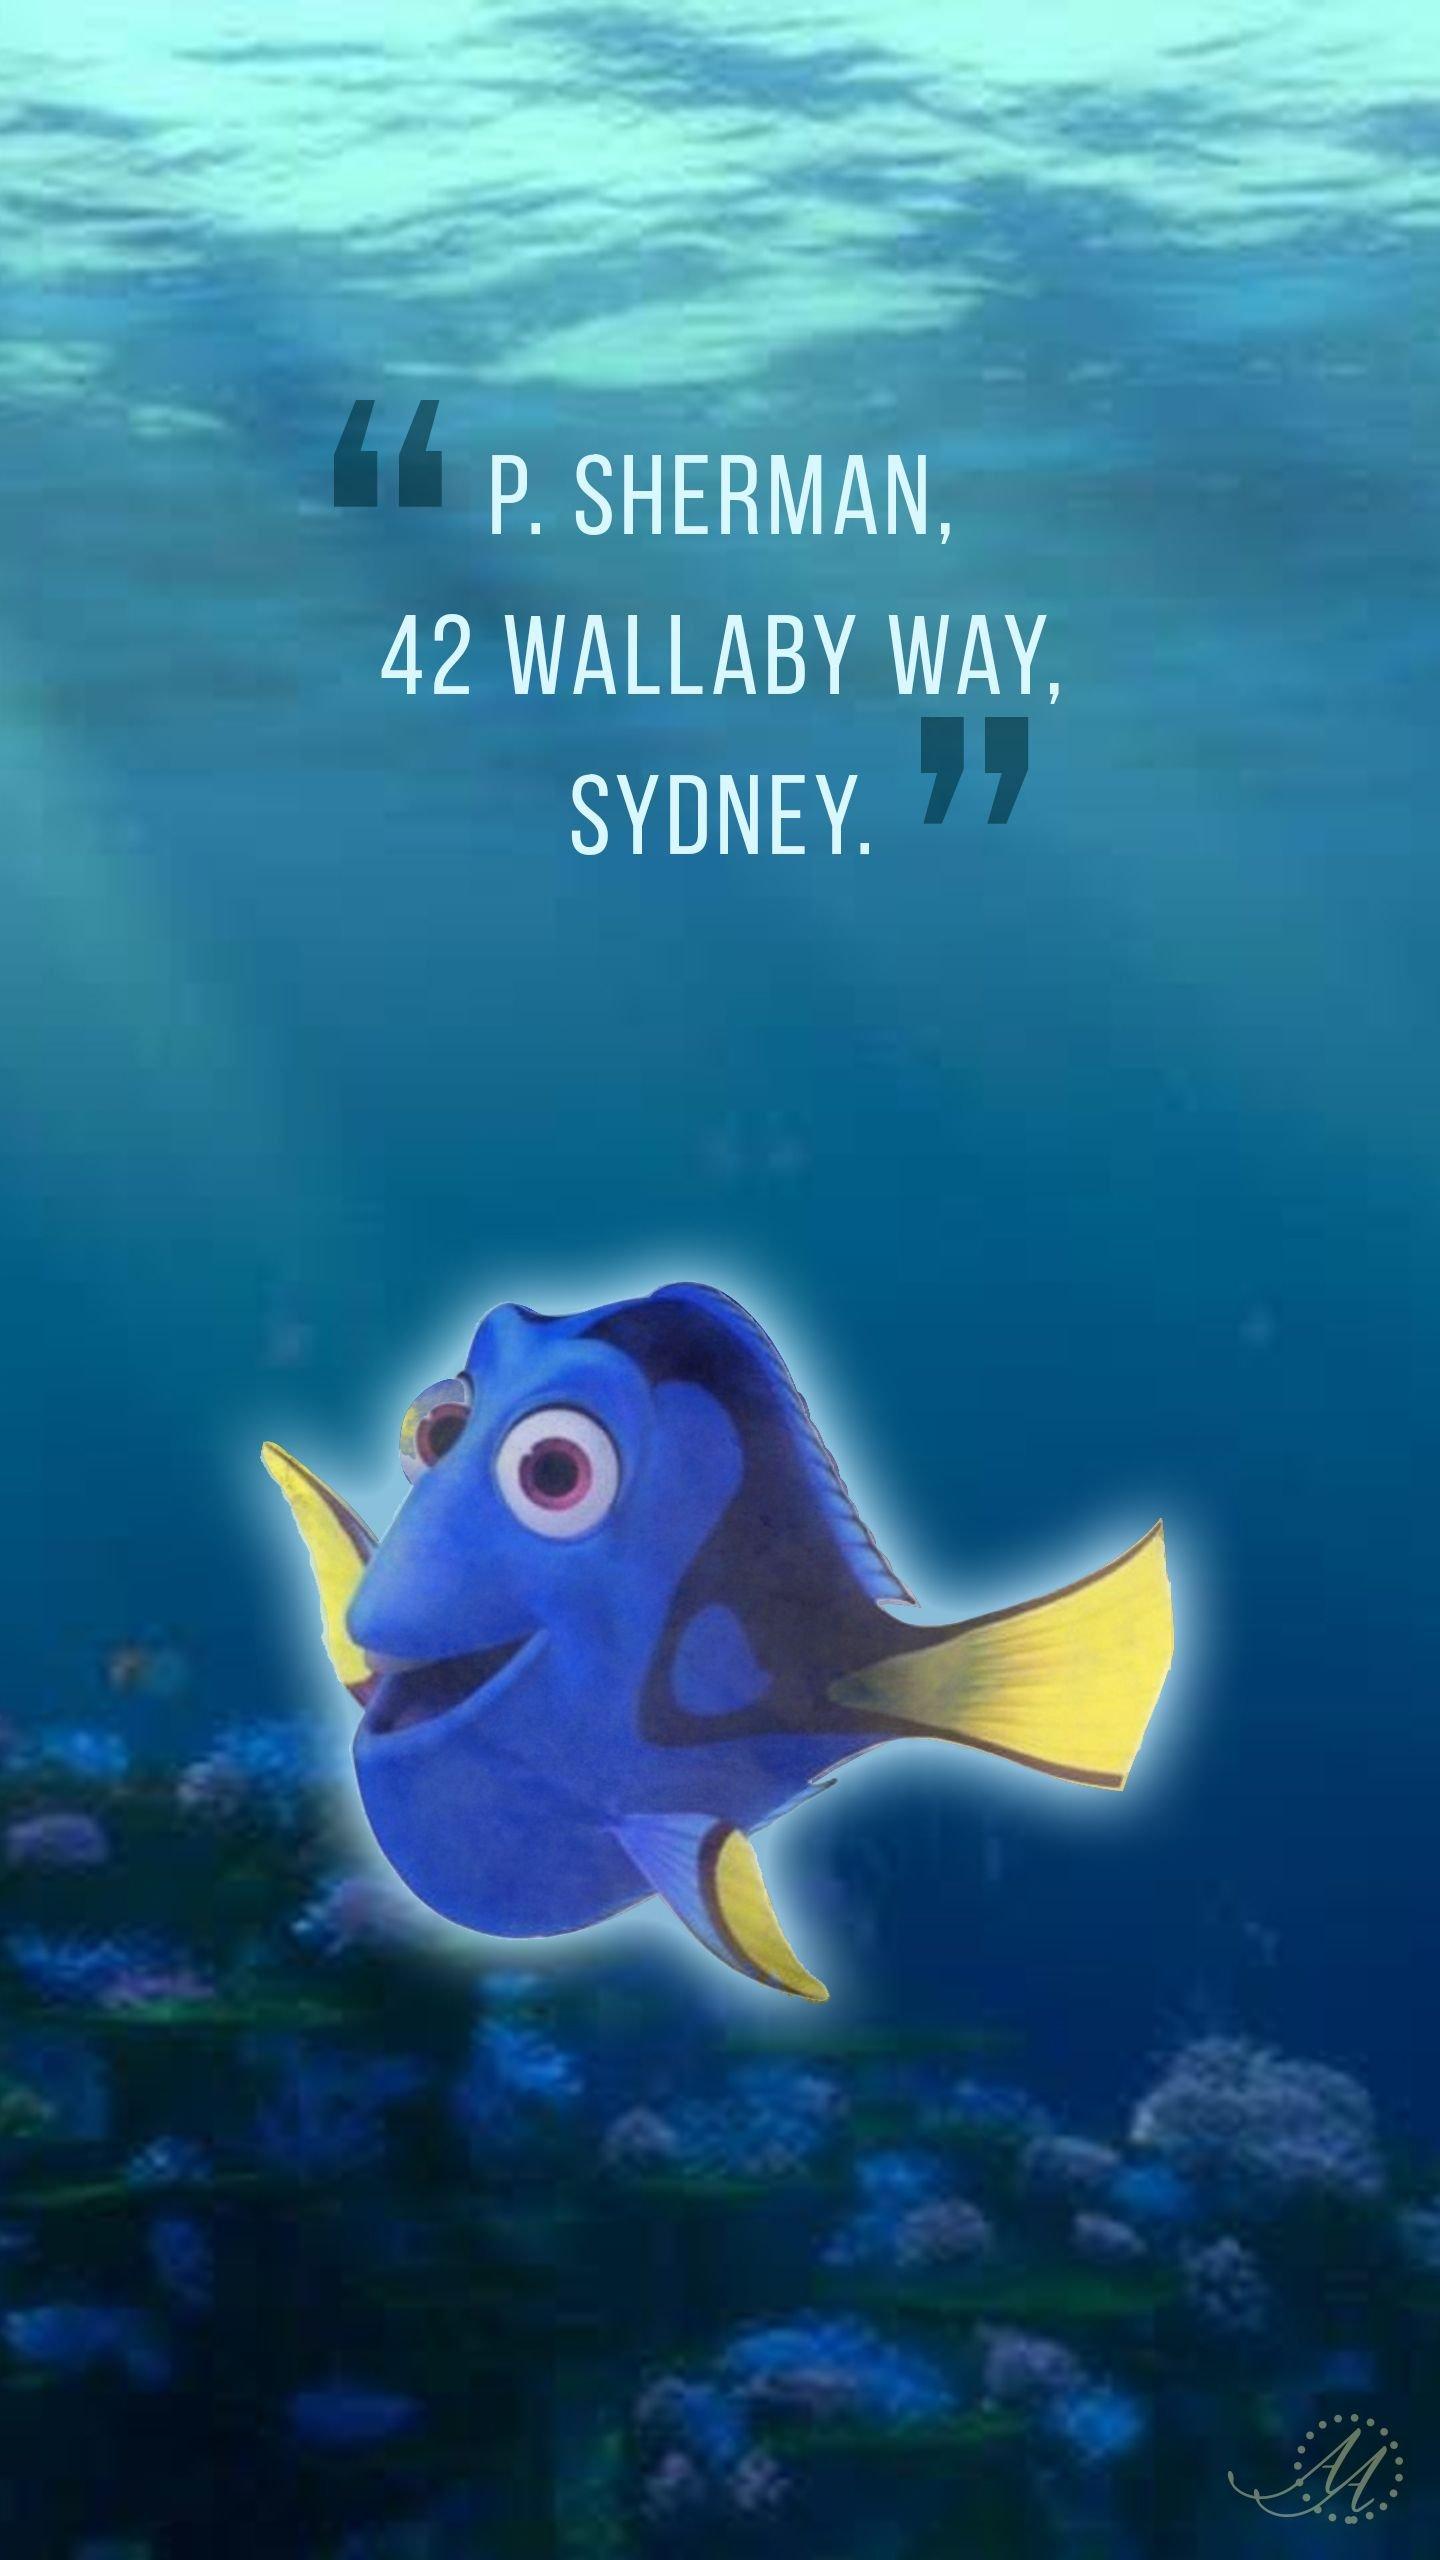 P. Sherman, 42 Wallaby Way, Sydney